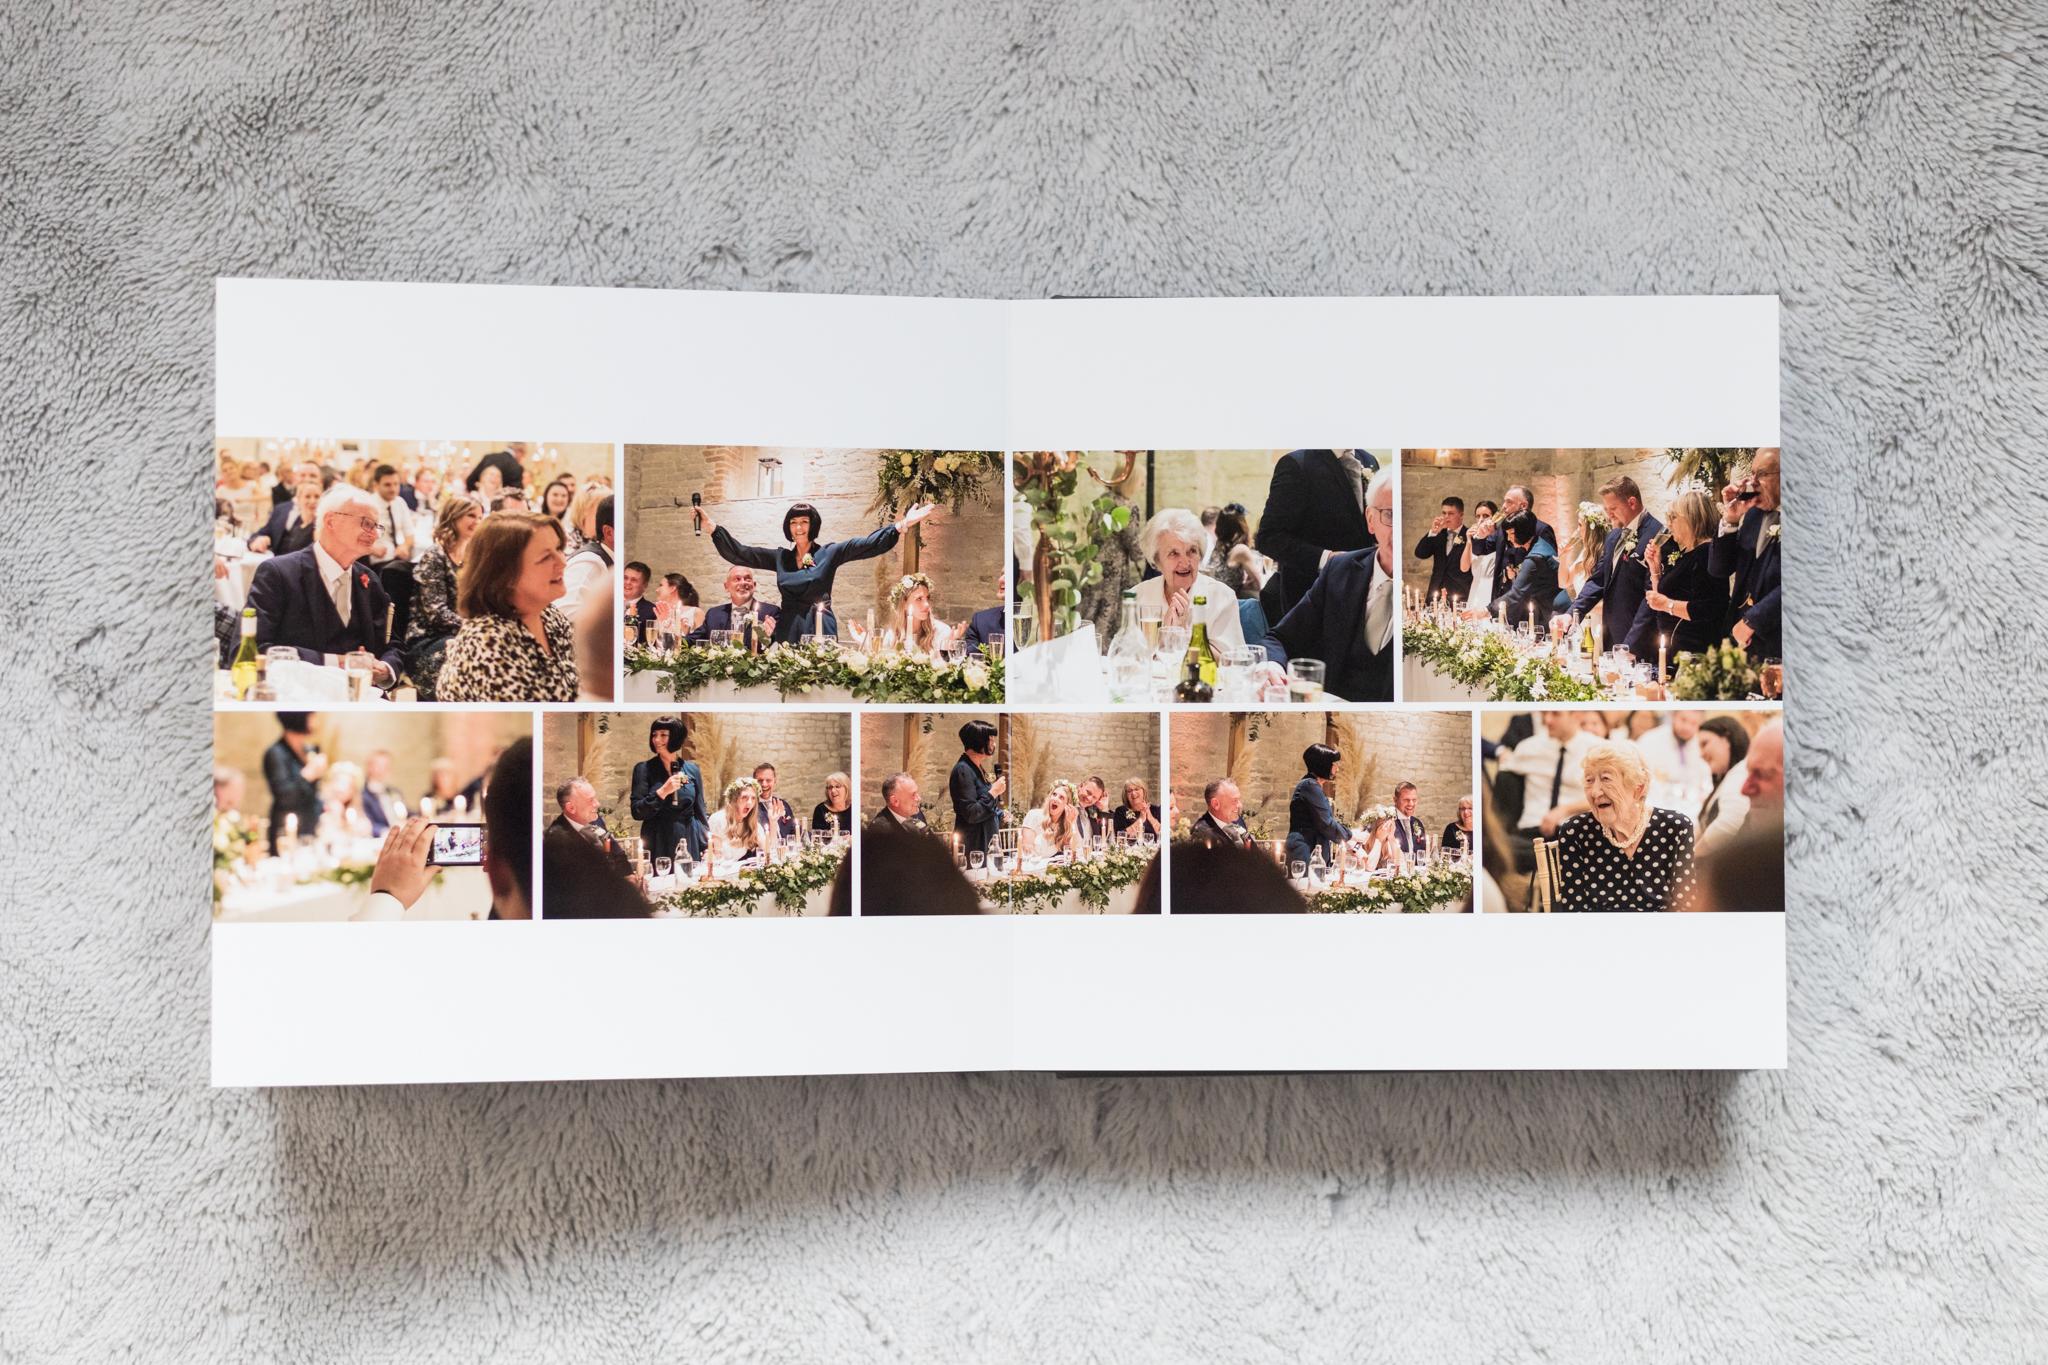 Mother_of_the_bride_speech_Deluxe_Storybook_Wedding_Album_Photographer_Rachel_Thornhill_Photography